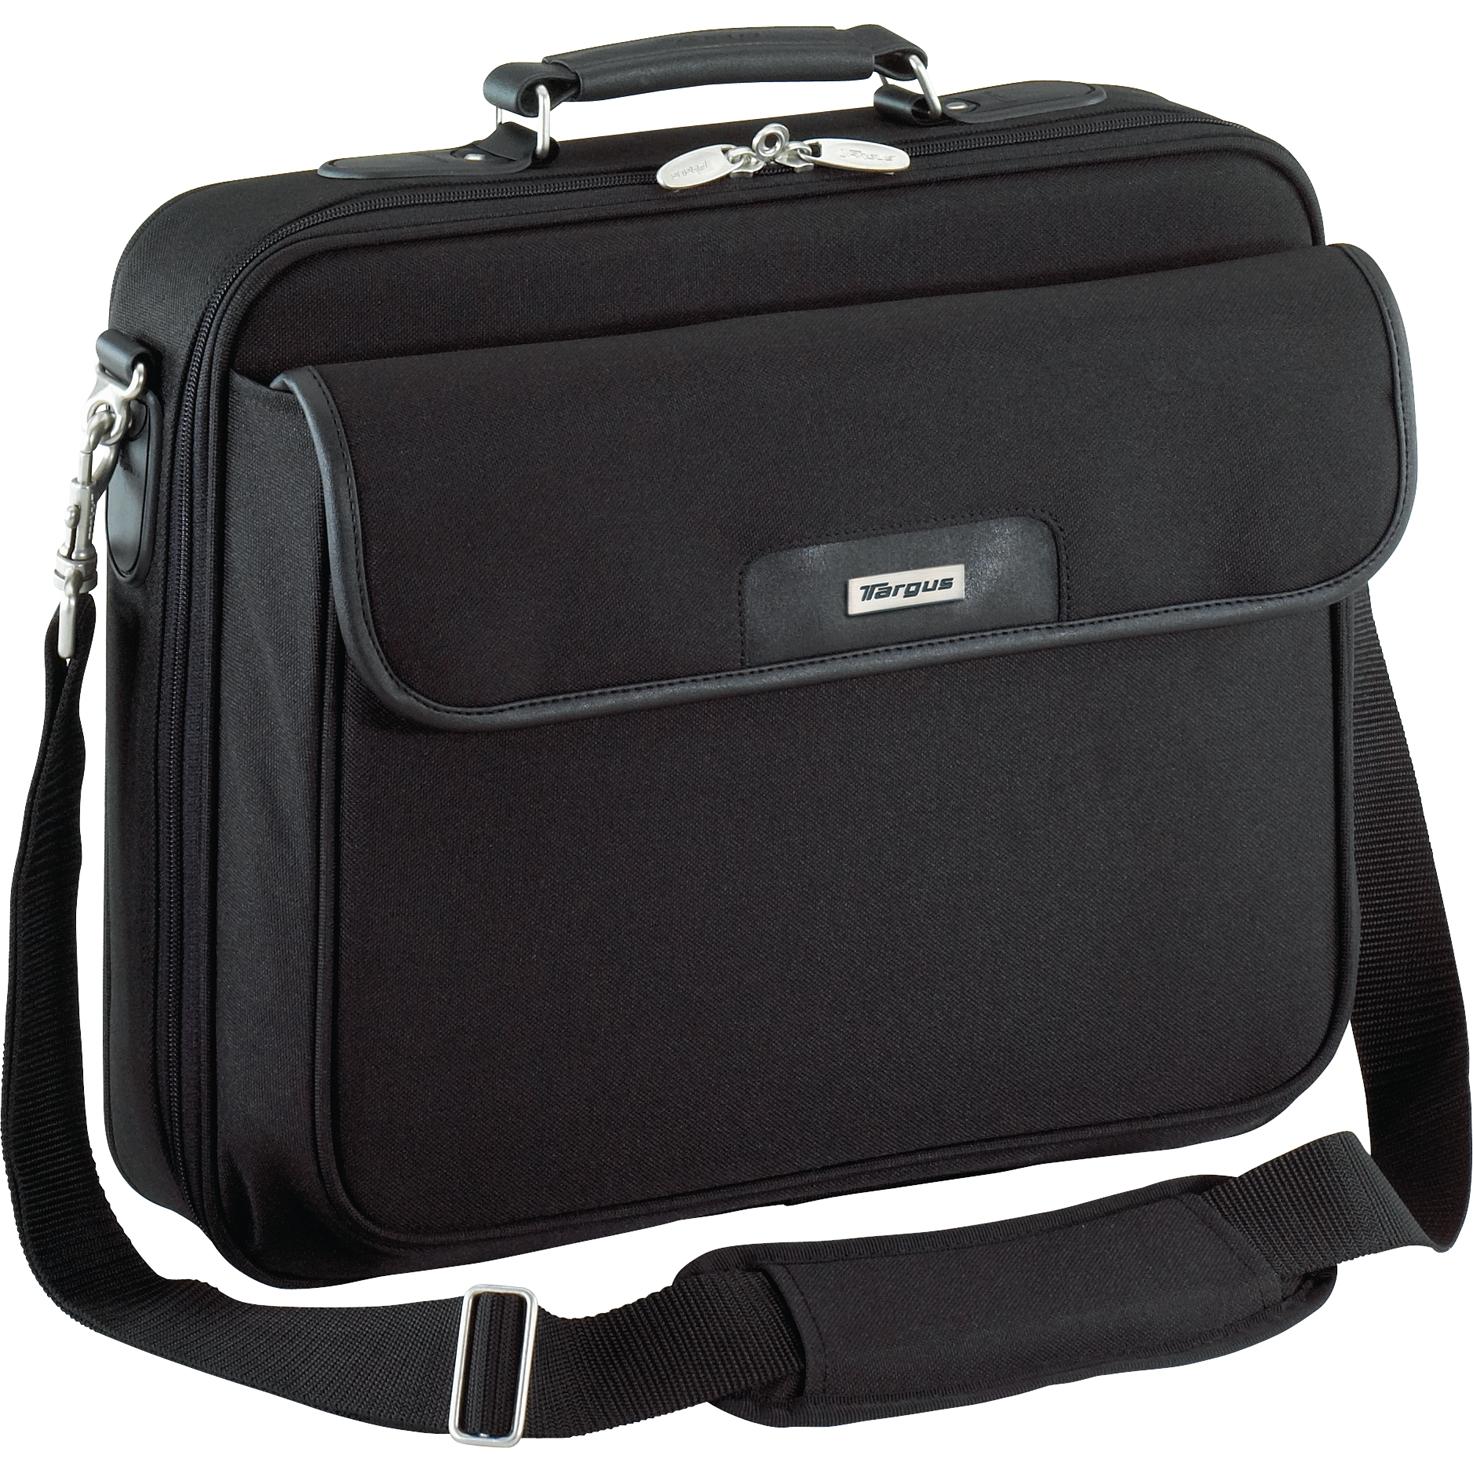 Swiss Military Laptop Backpack Bag in Bengaluru